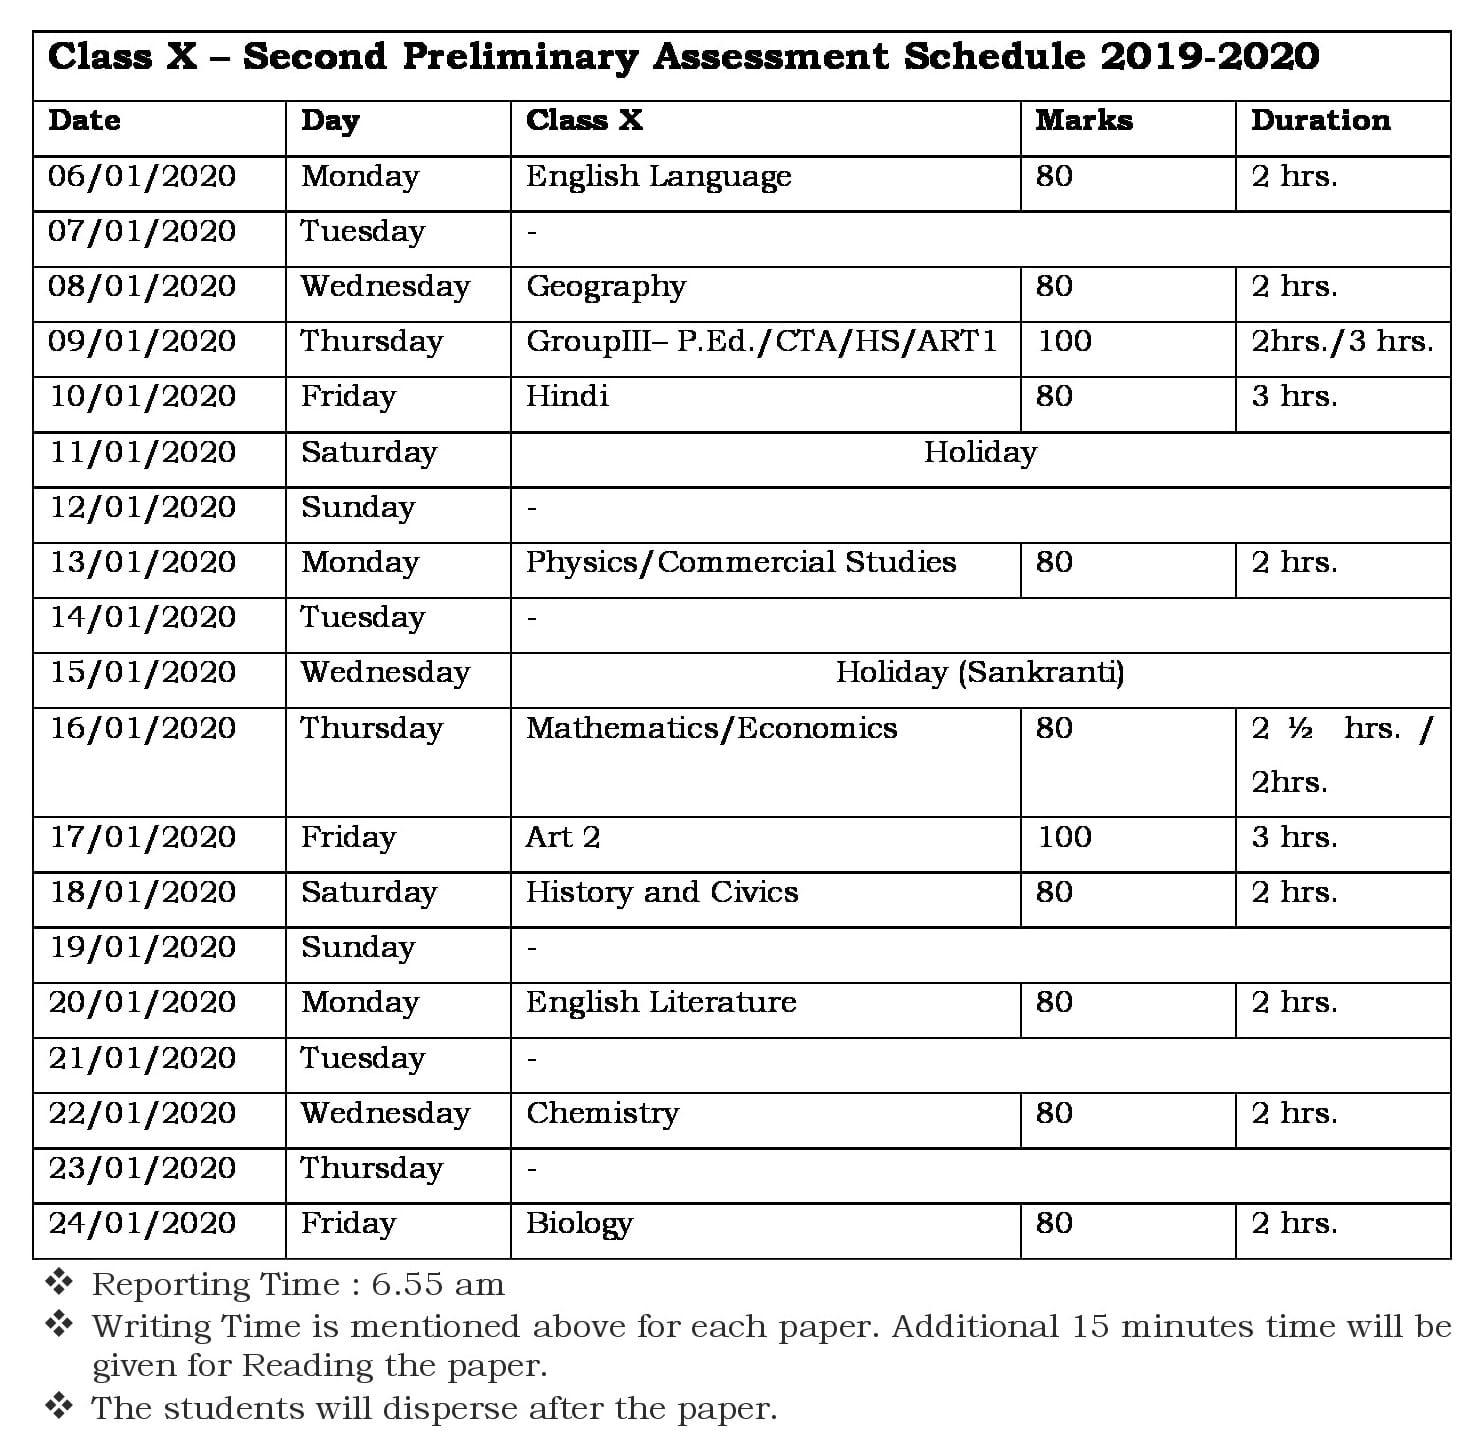 Prelim 2 Schedule for Class X